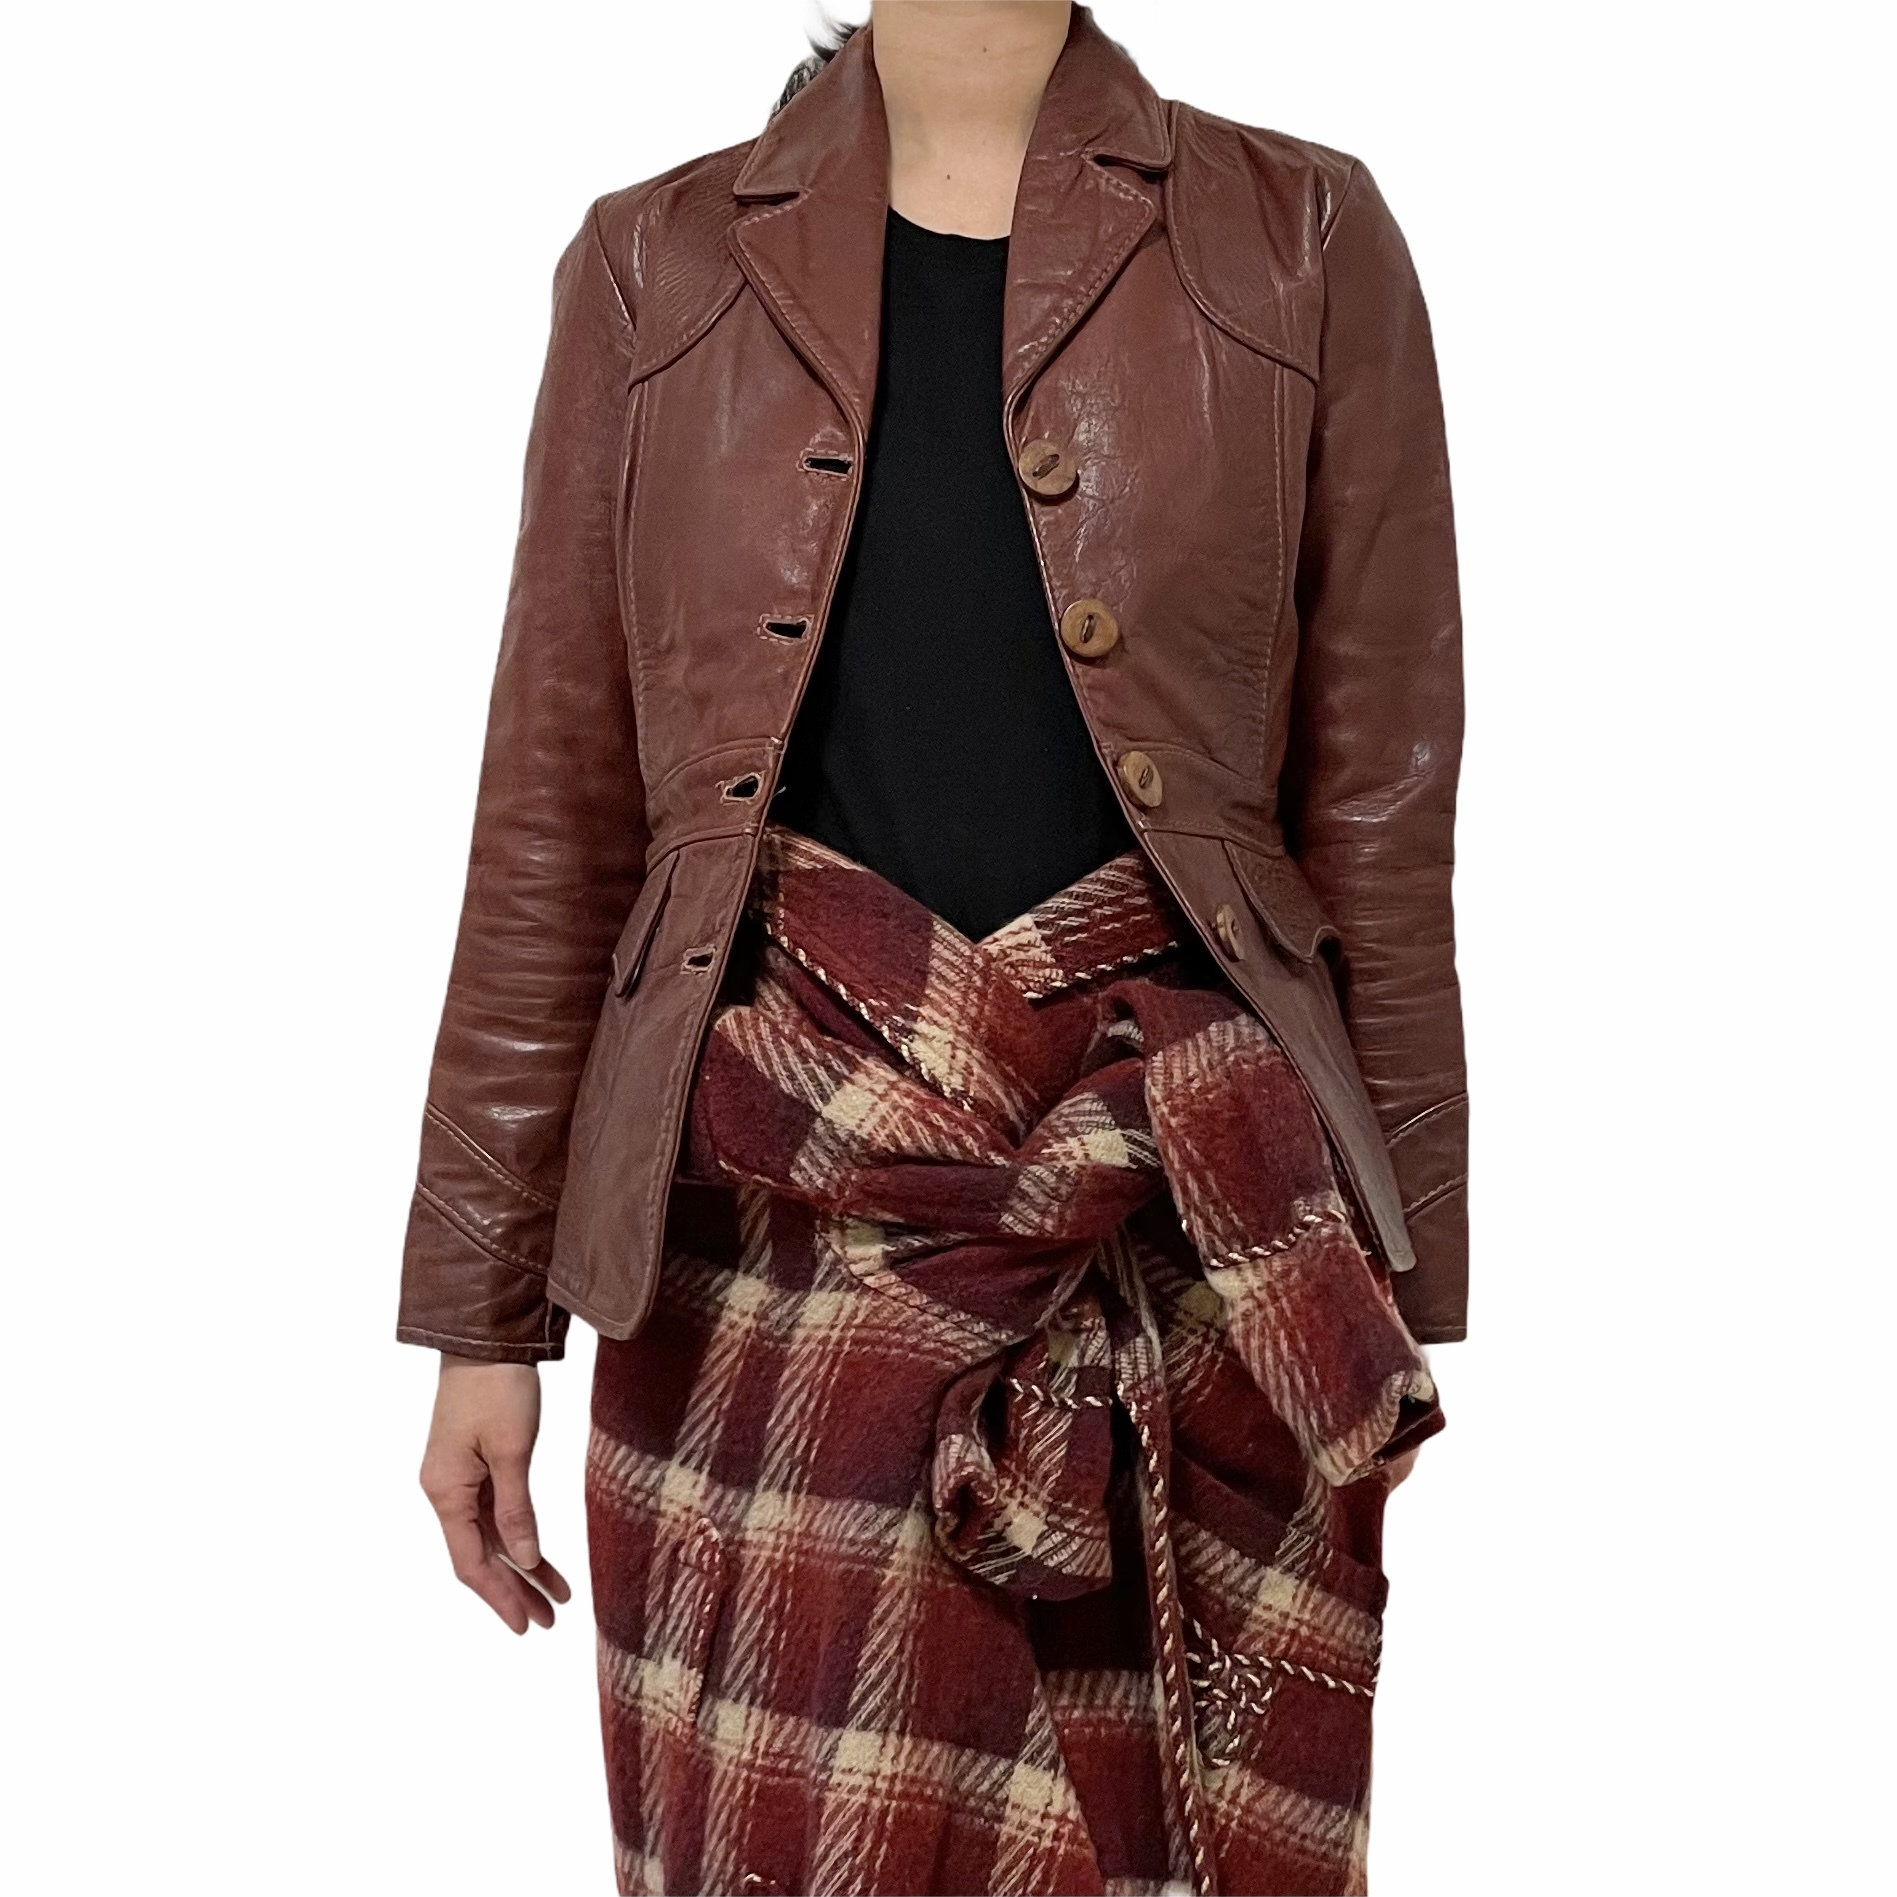 70's OSHWAHKON Brown Leather Jacket